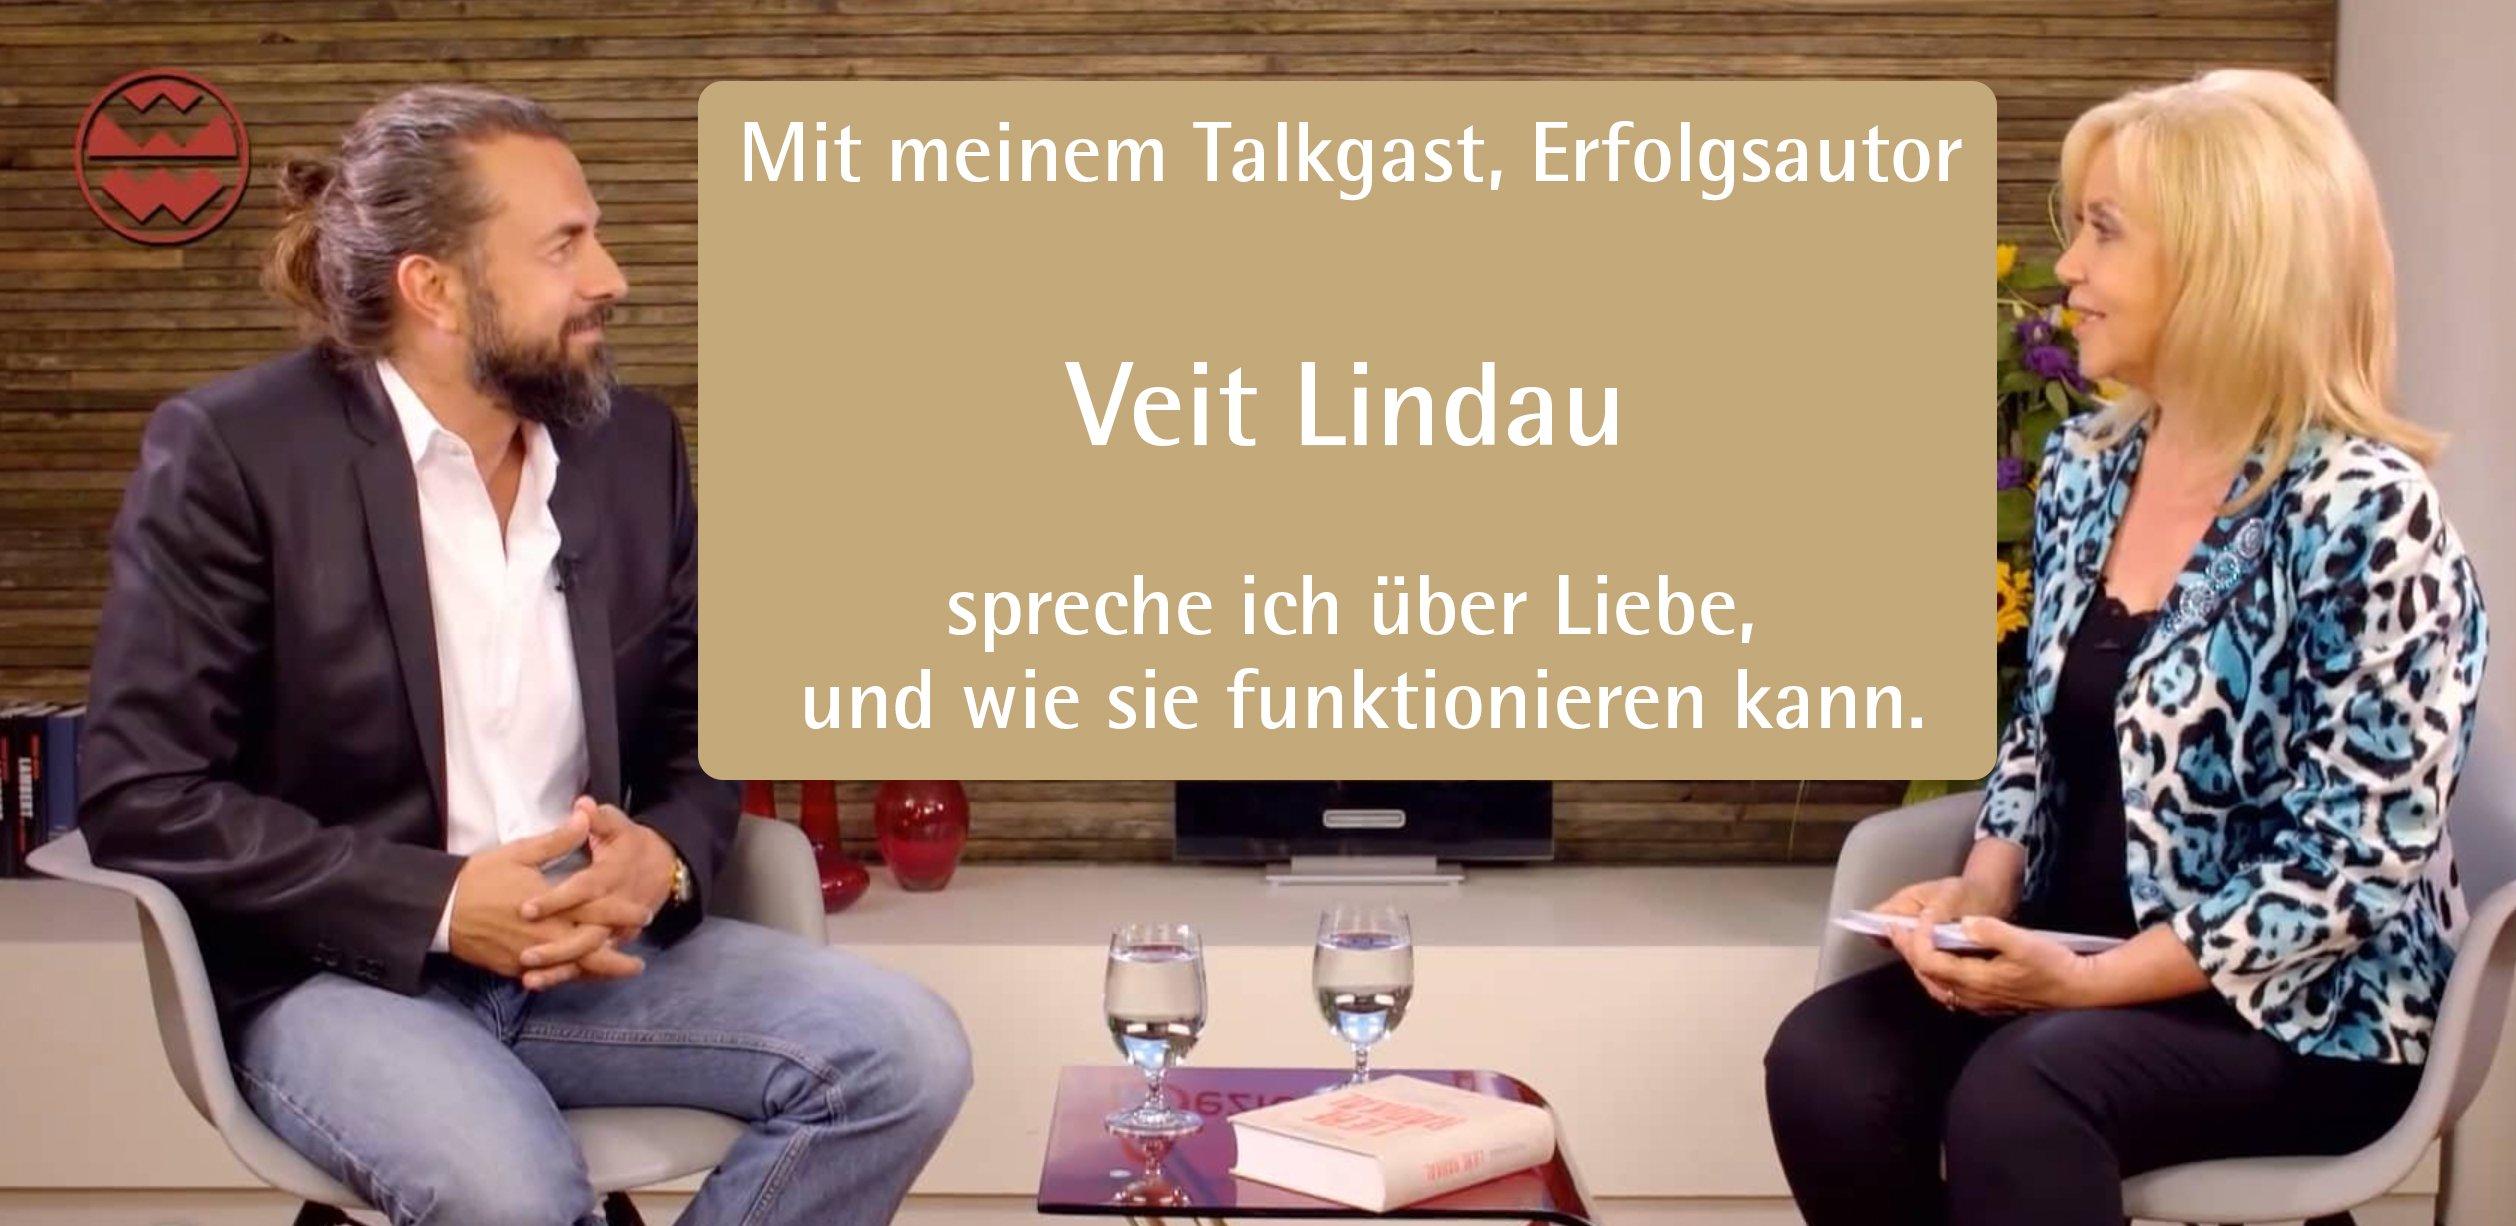 Frankfurt veit lindau Lindauer aus